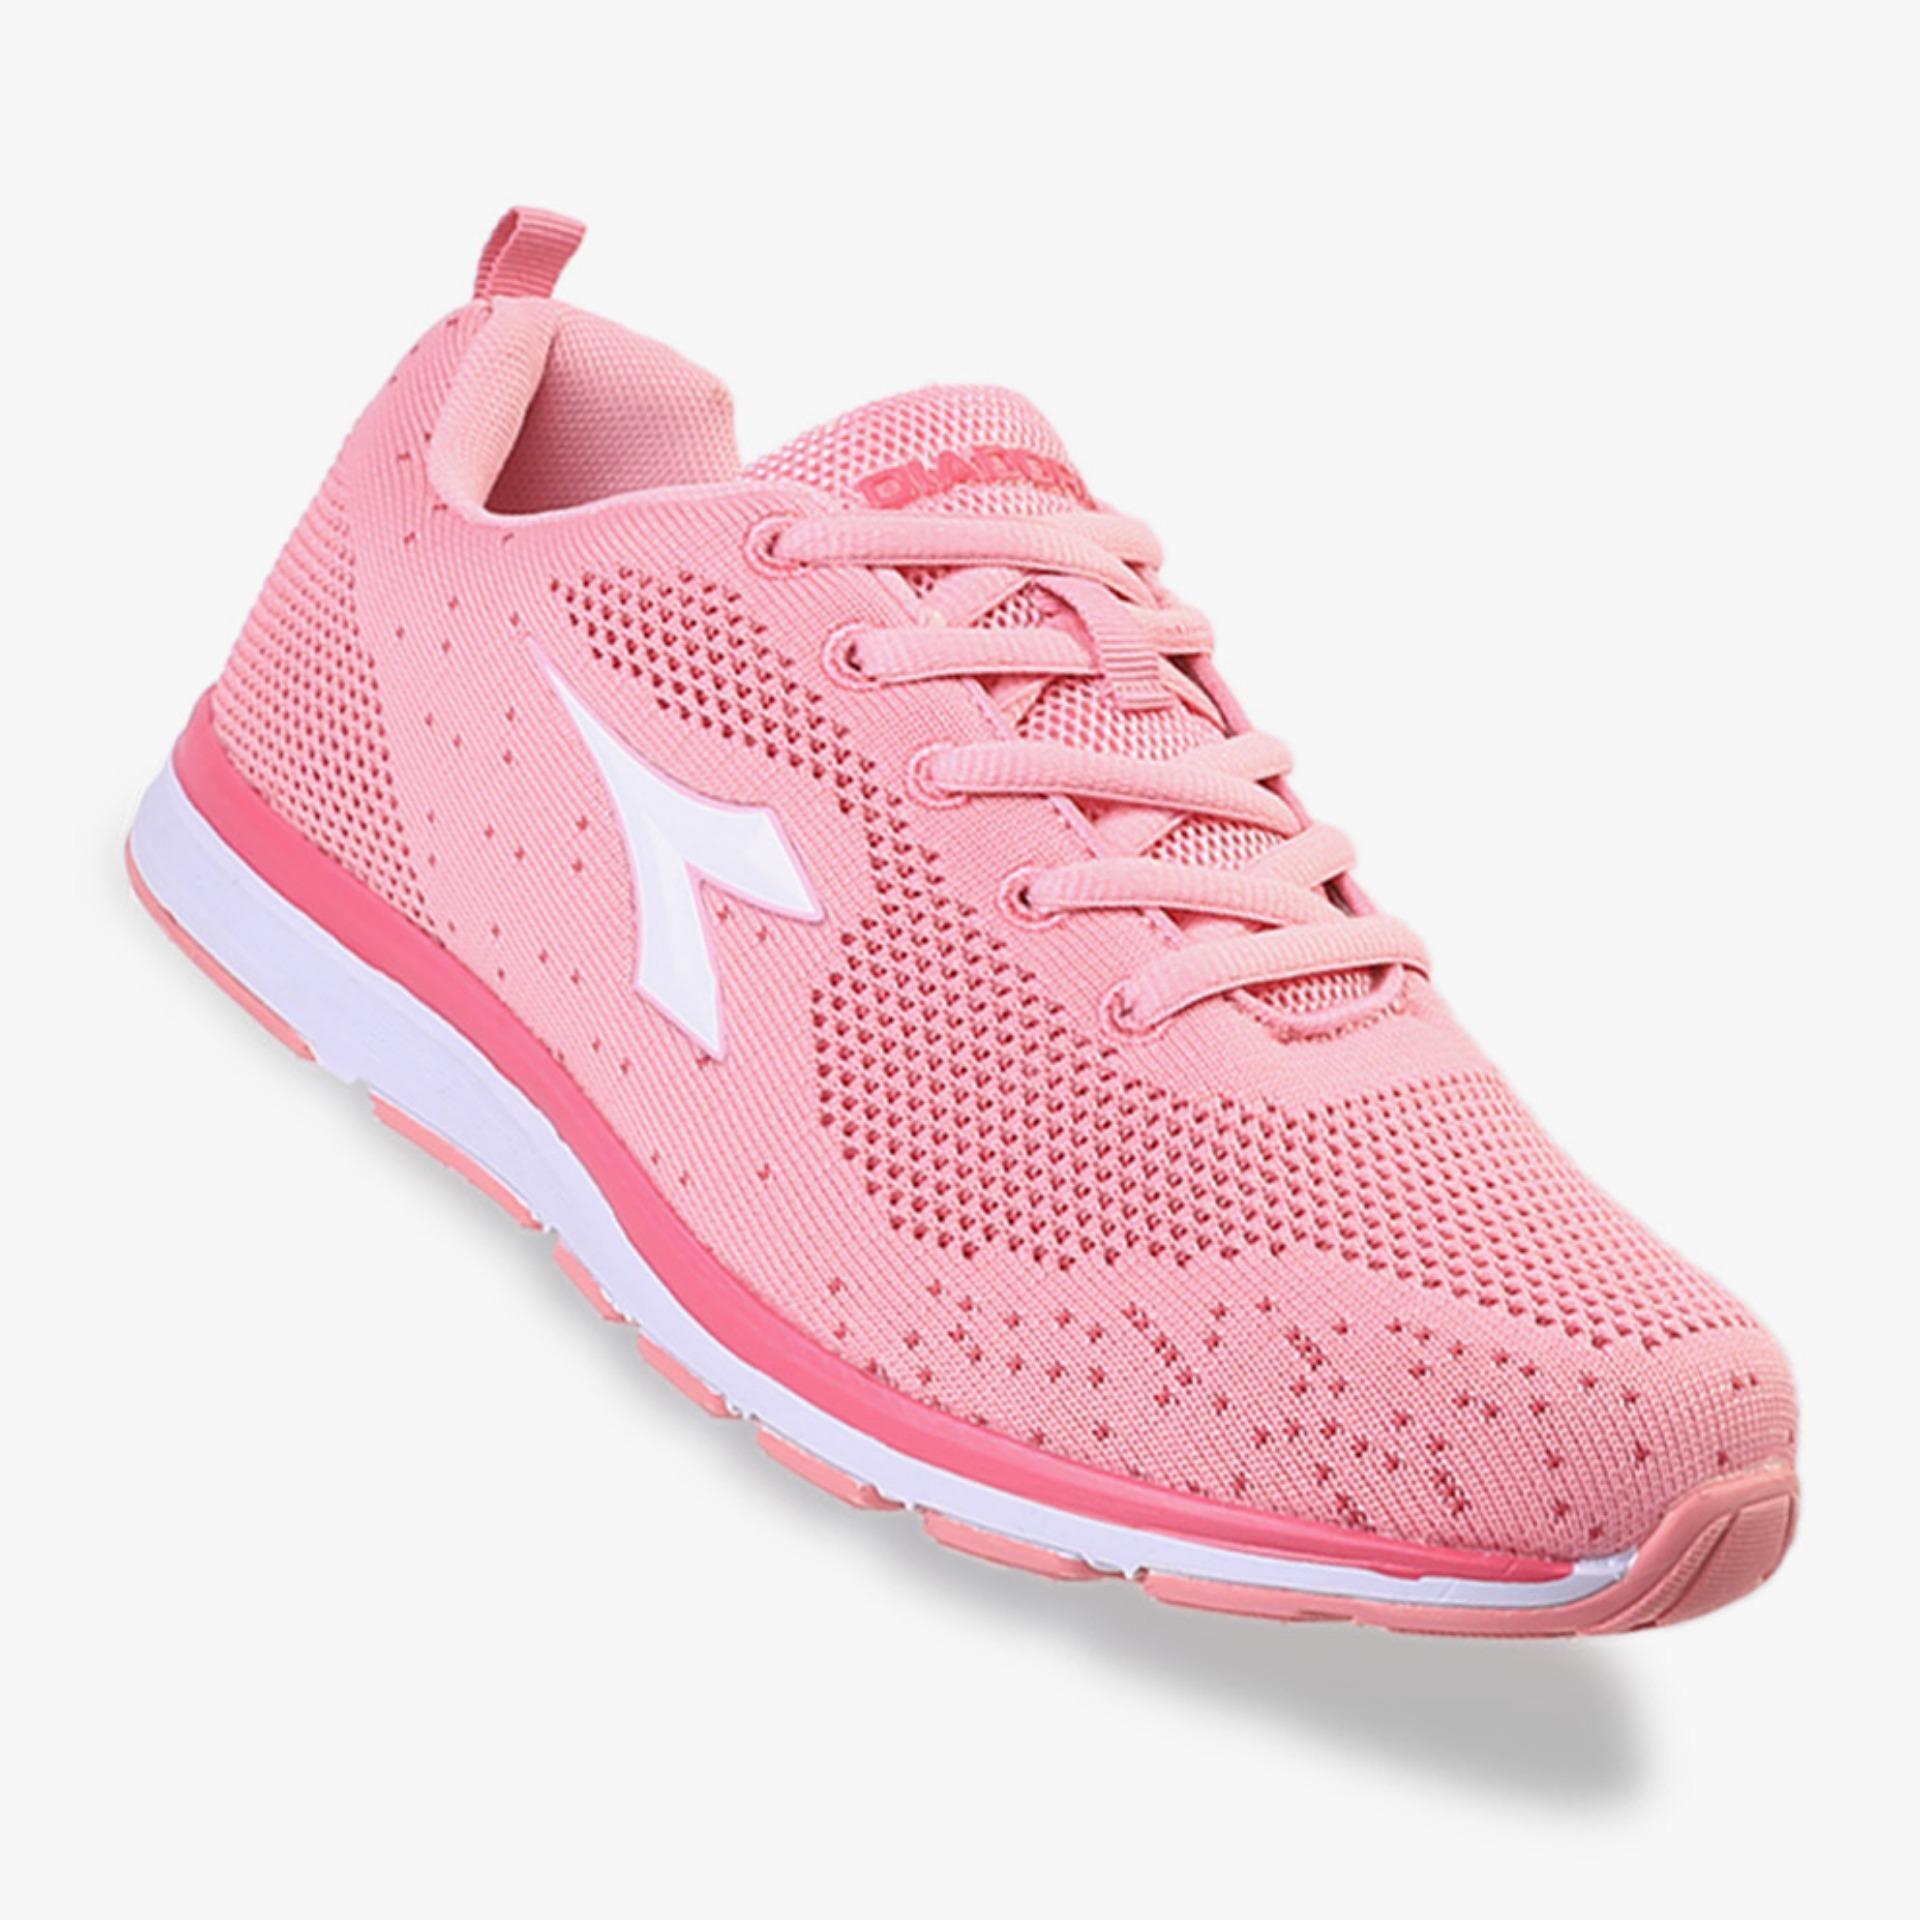 Harga Diadora Fiorelo Women S Running Shoes Pink Fullset Murah